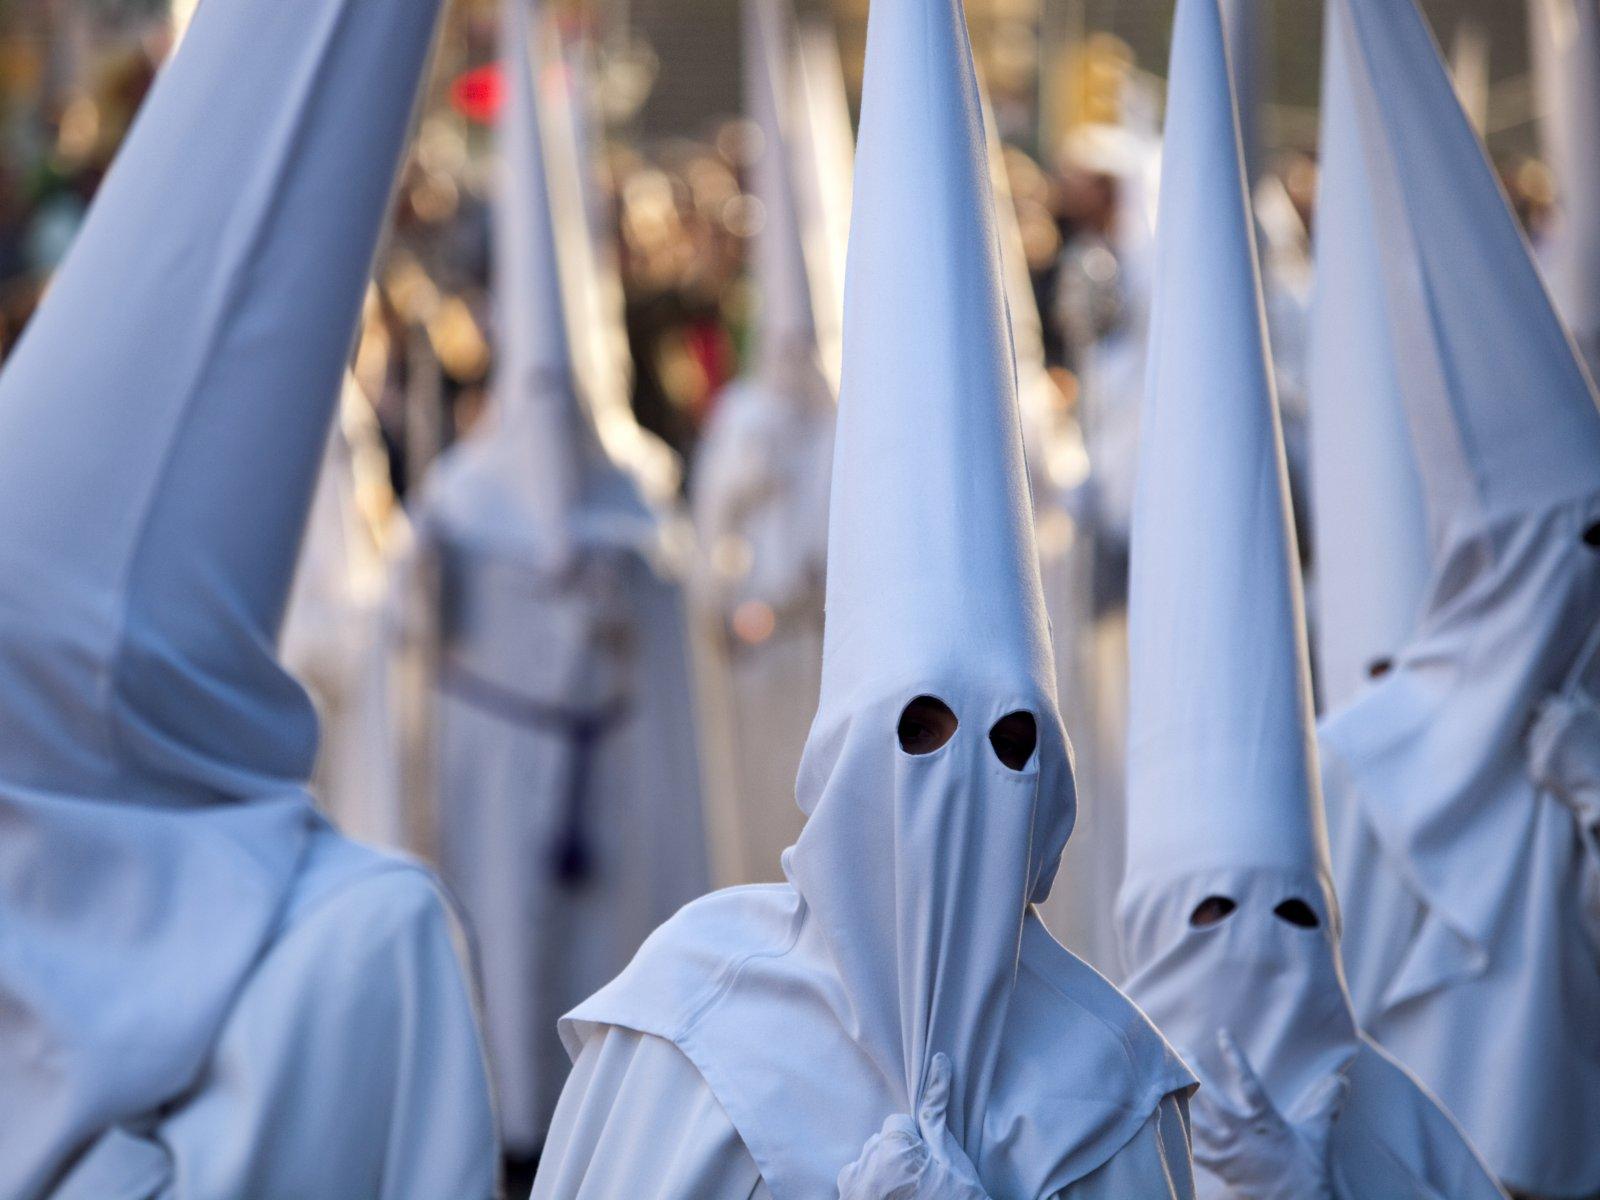 Nazarenos during Semana Santa in Malaga, Spain